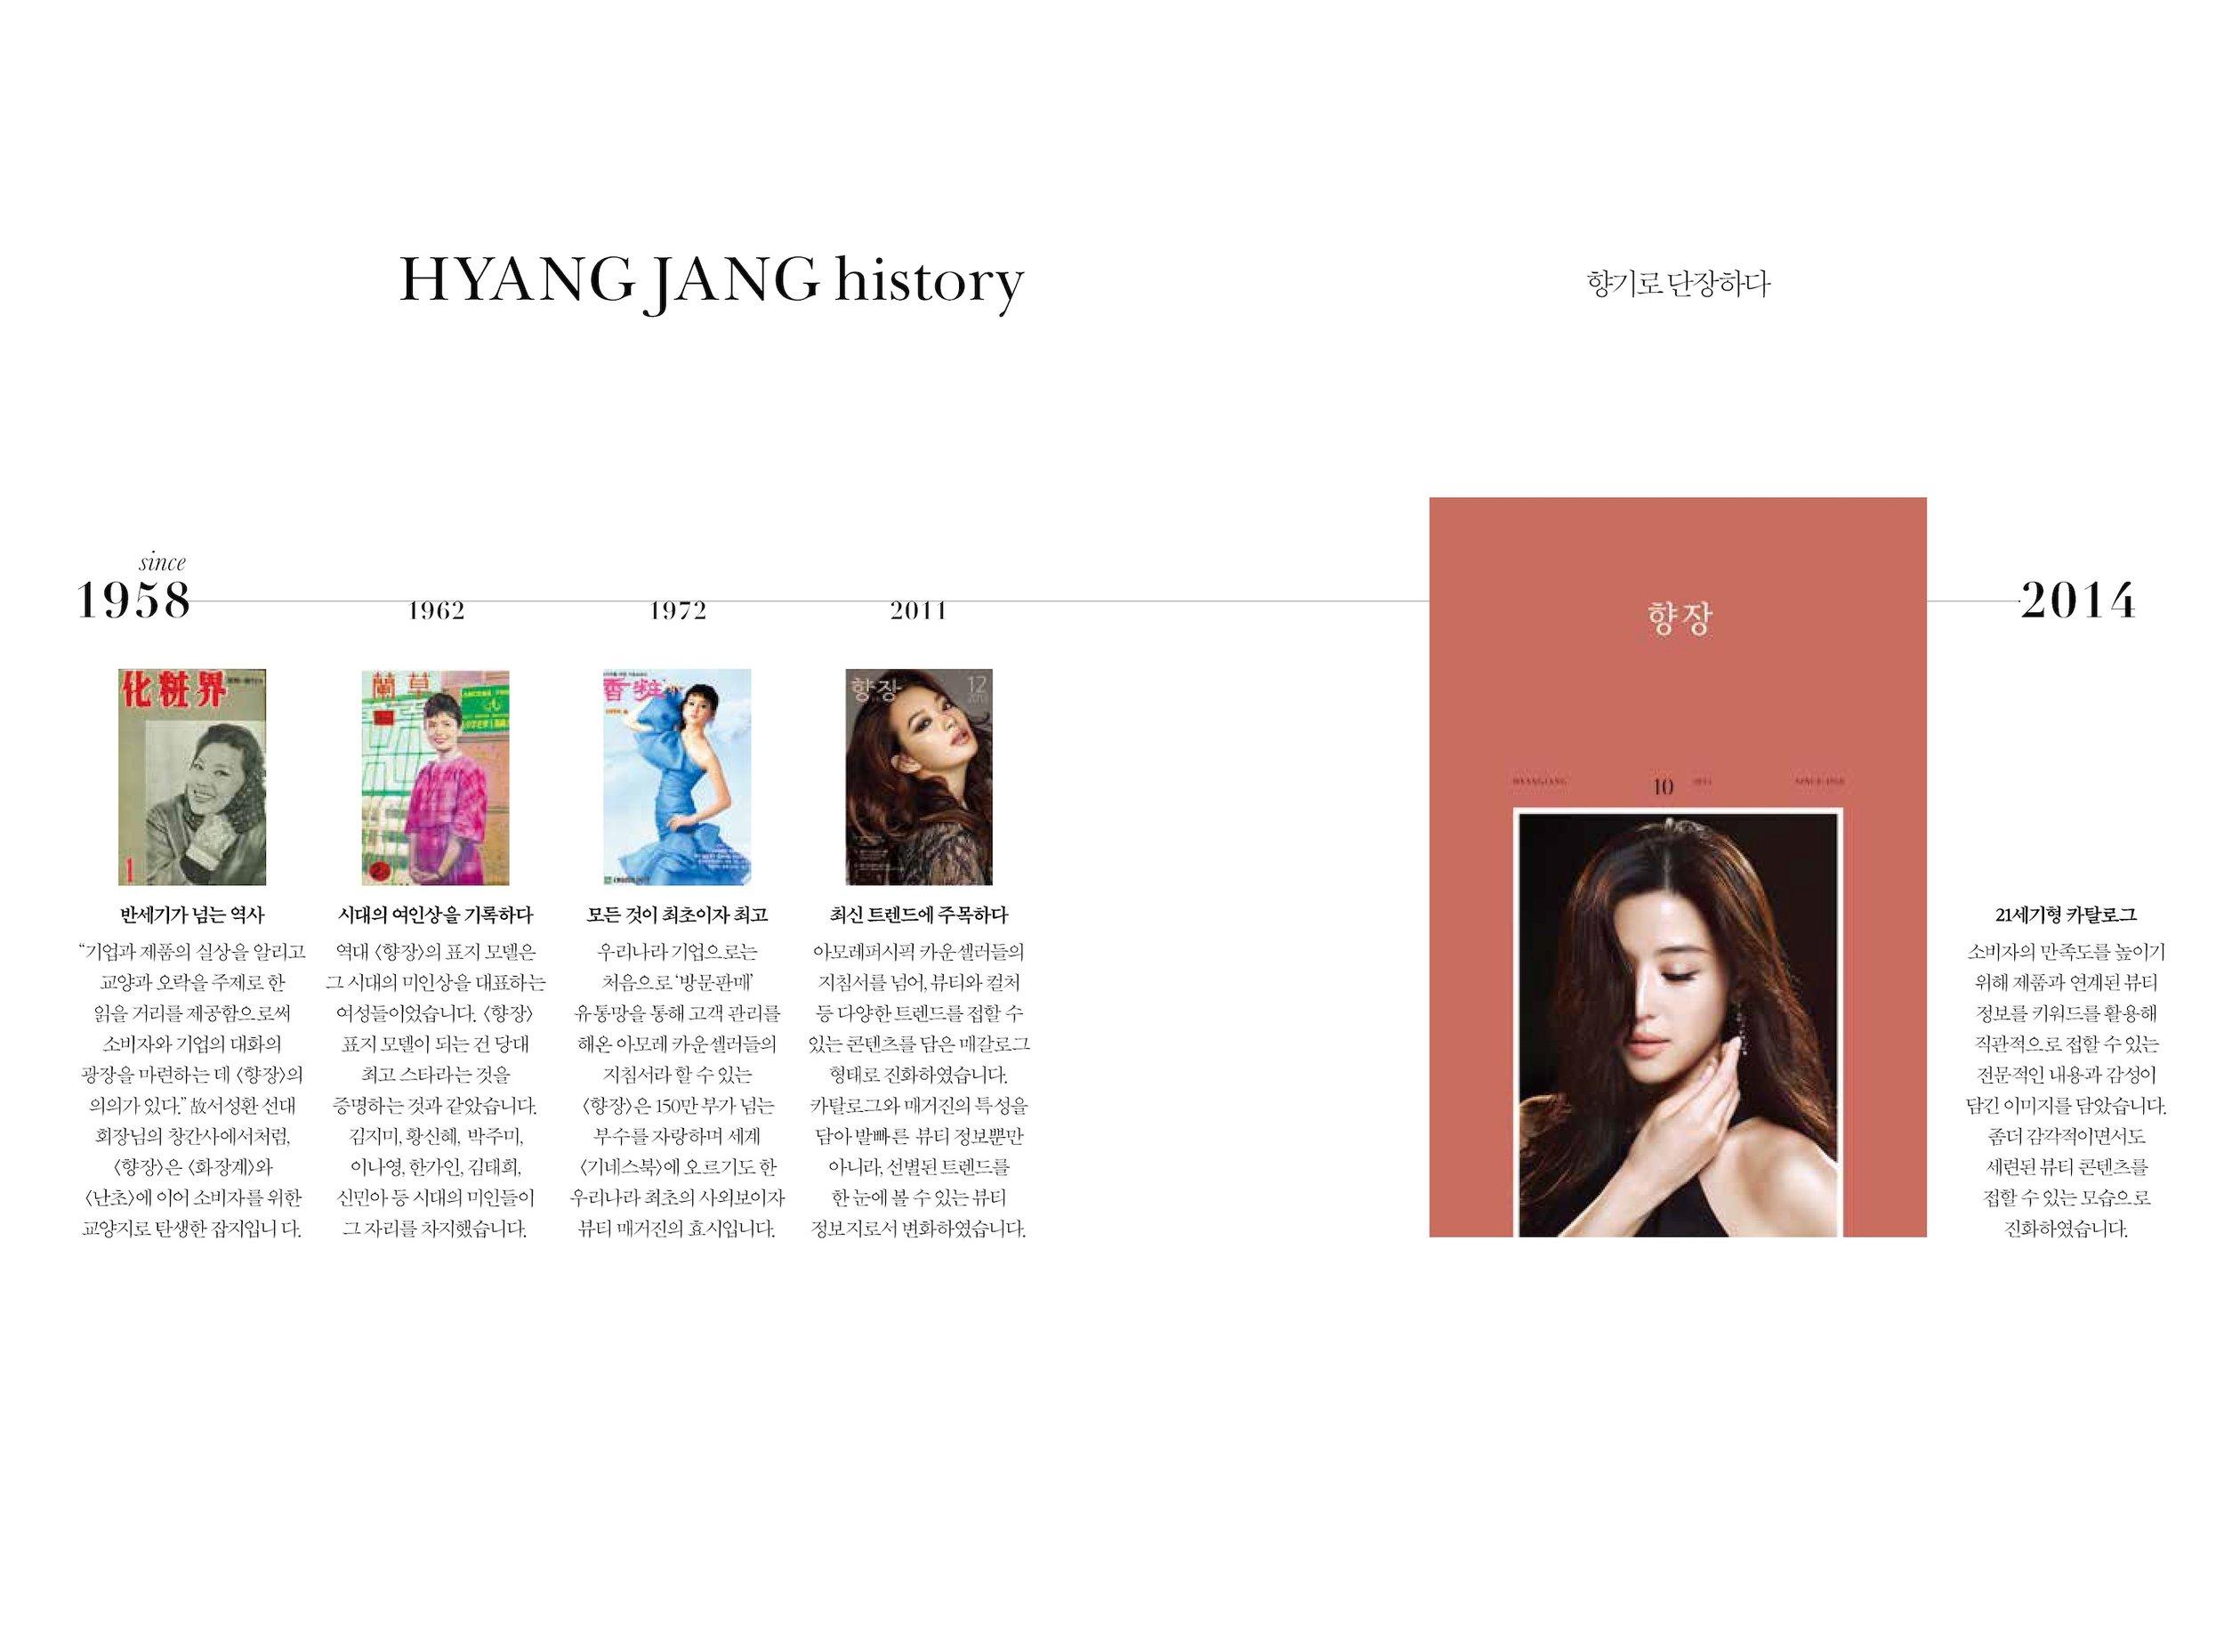 hyangjang-201410_페이지_02.jpeg